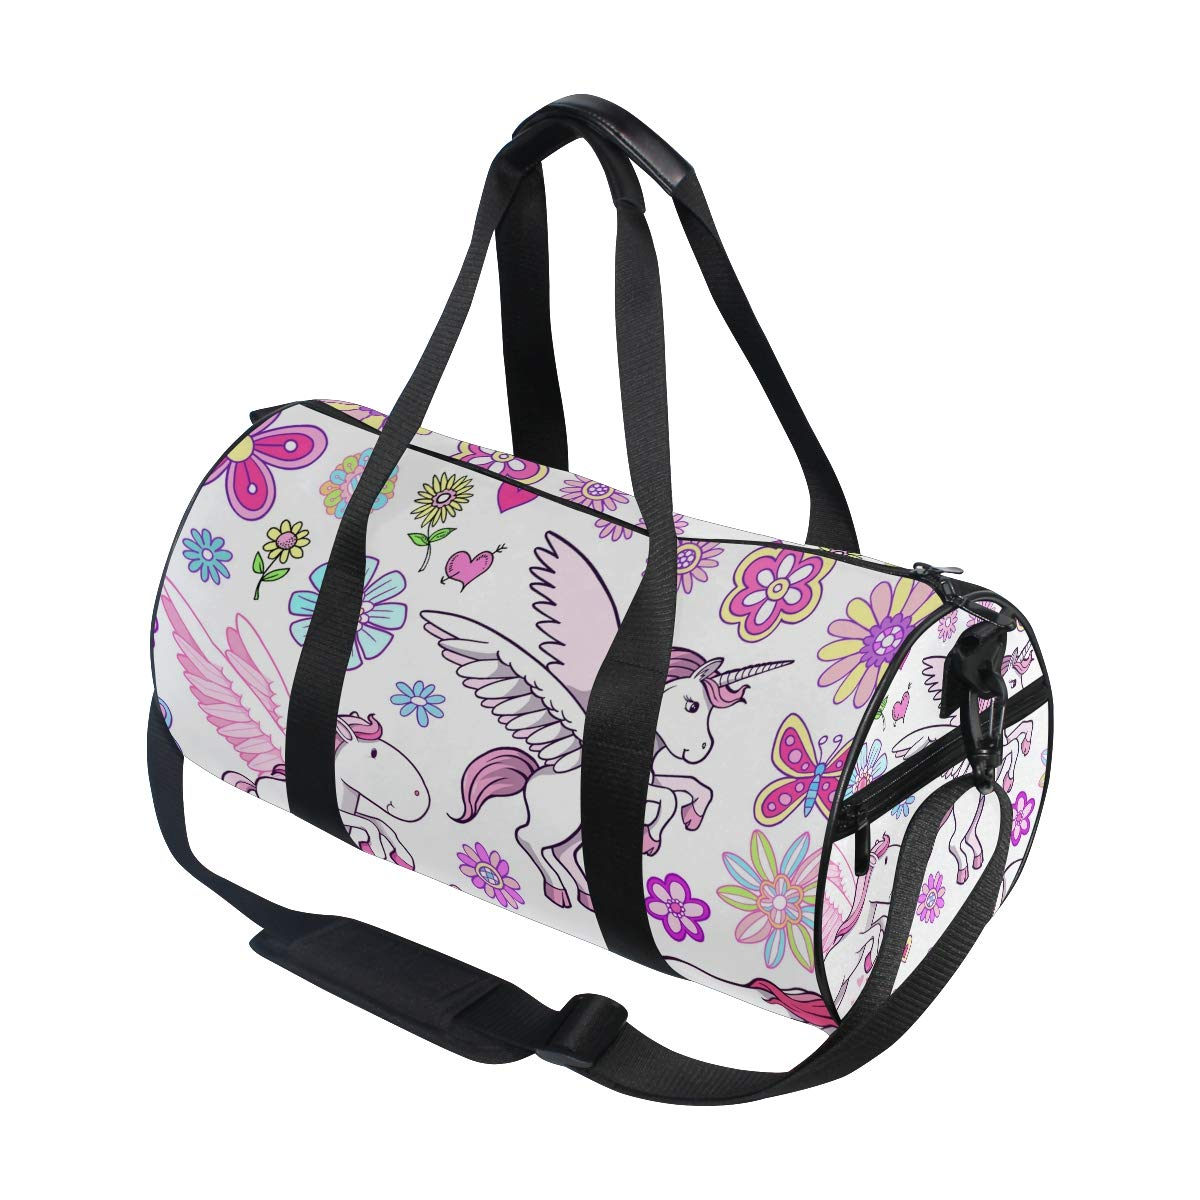 WIHVE Gym Duffel Bag Unicorn Pegasus Fairytale Spring Sports Lightweight Canvas Travel Luggage Bag